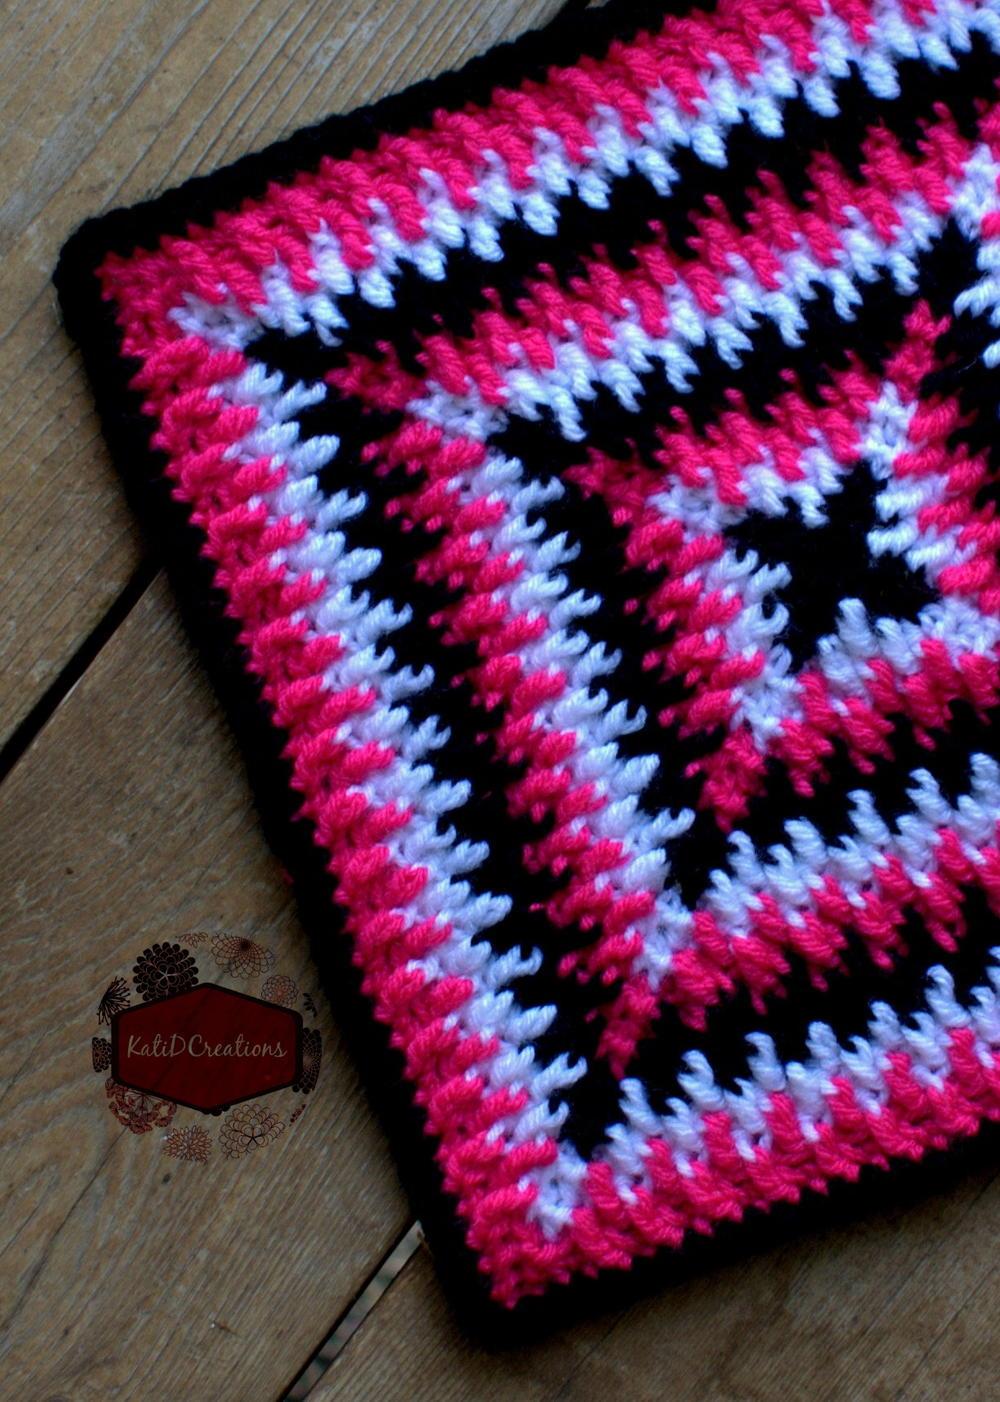 Crochet Patterns For Children s Blankets : Mosaic Ripples Granny Square AllFreeCrochet.com